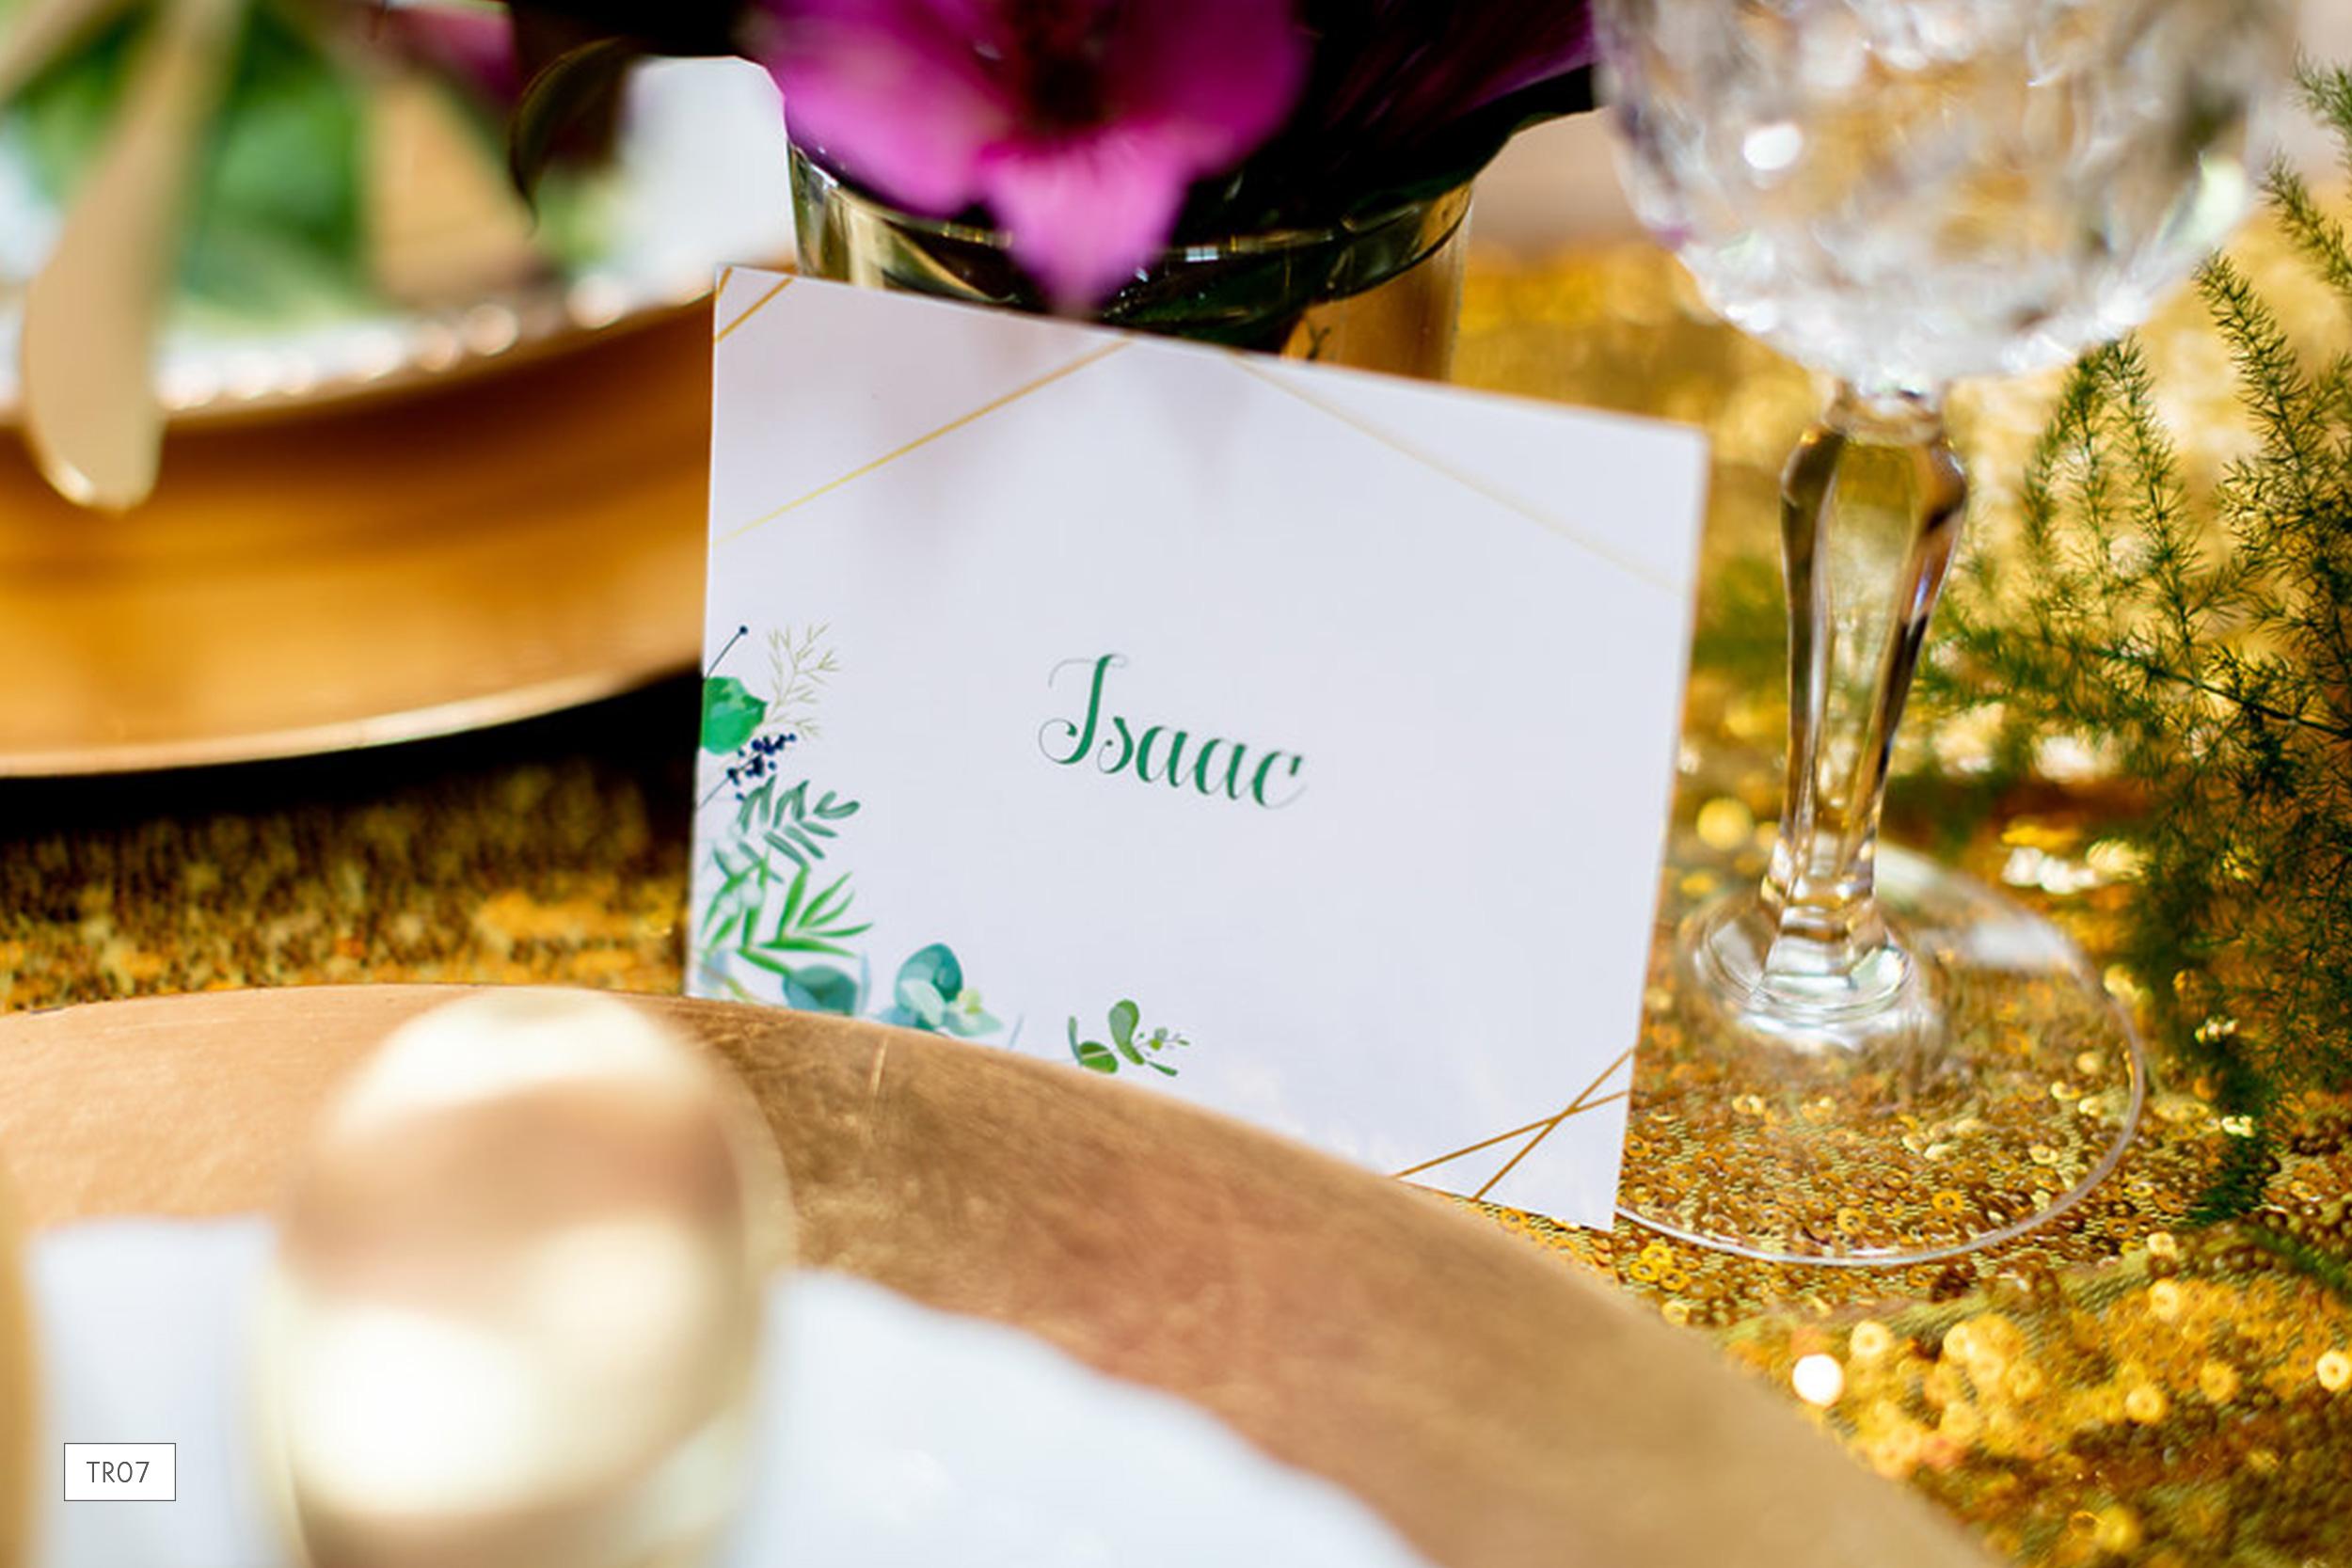 tr07-tropical-wedding-placecard.jpg